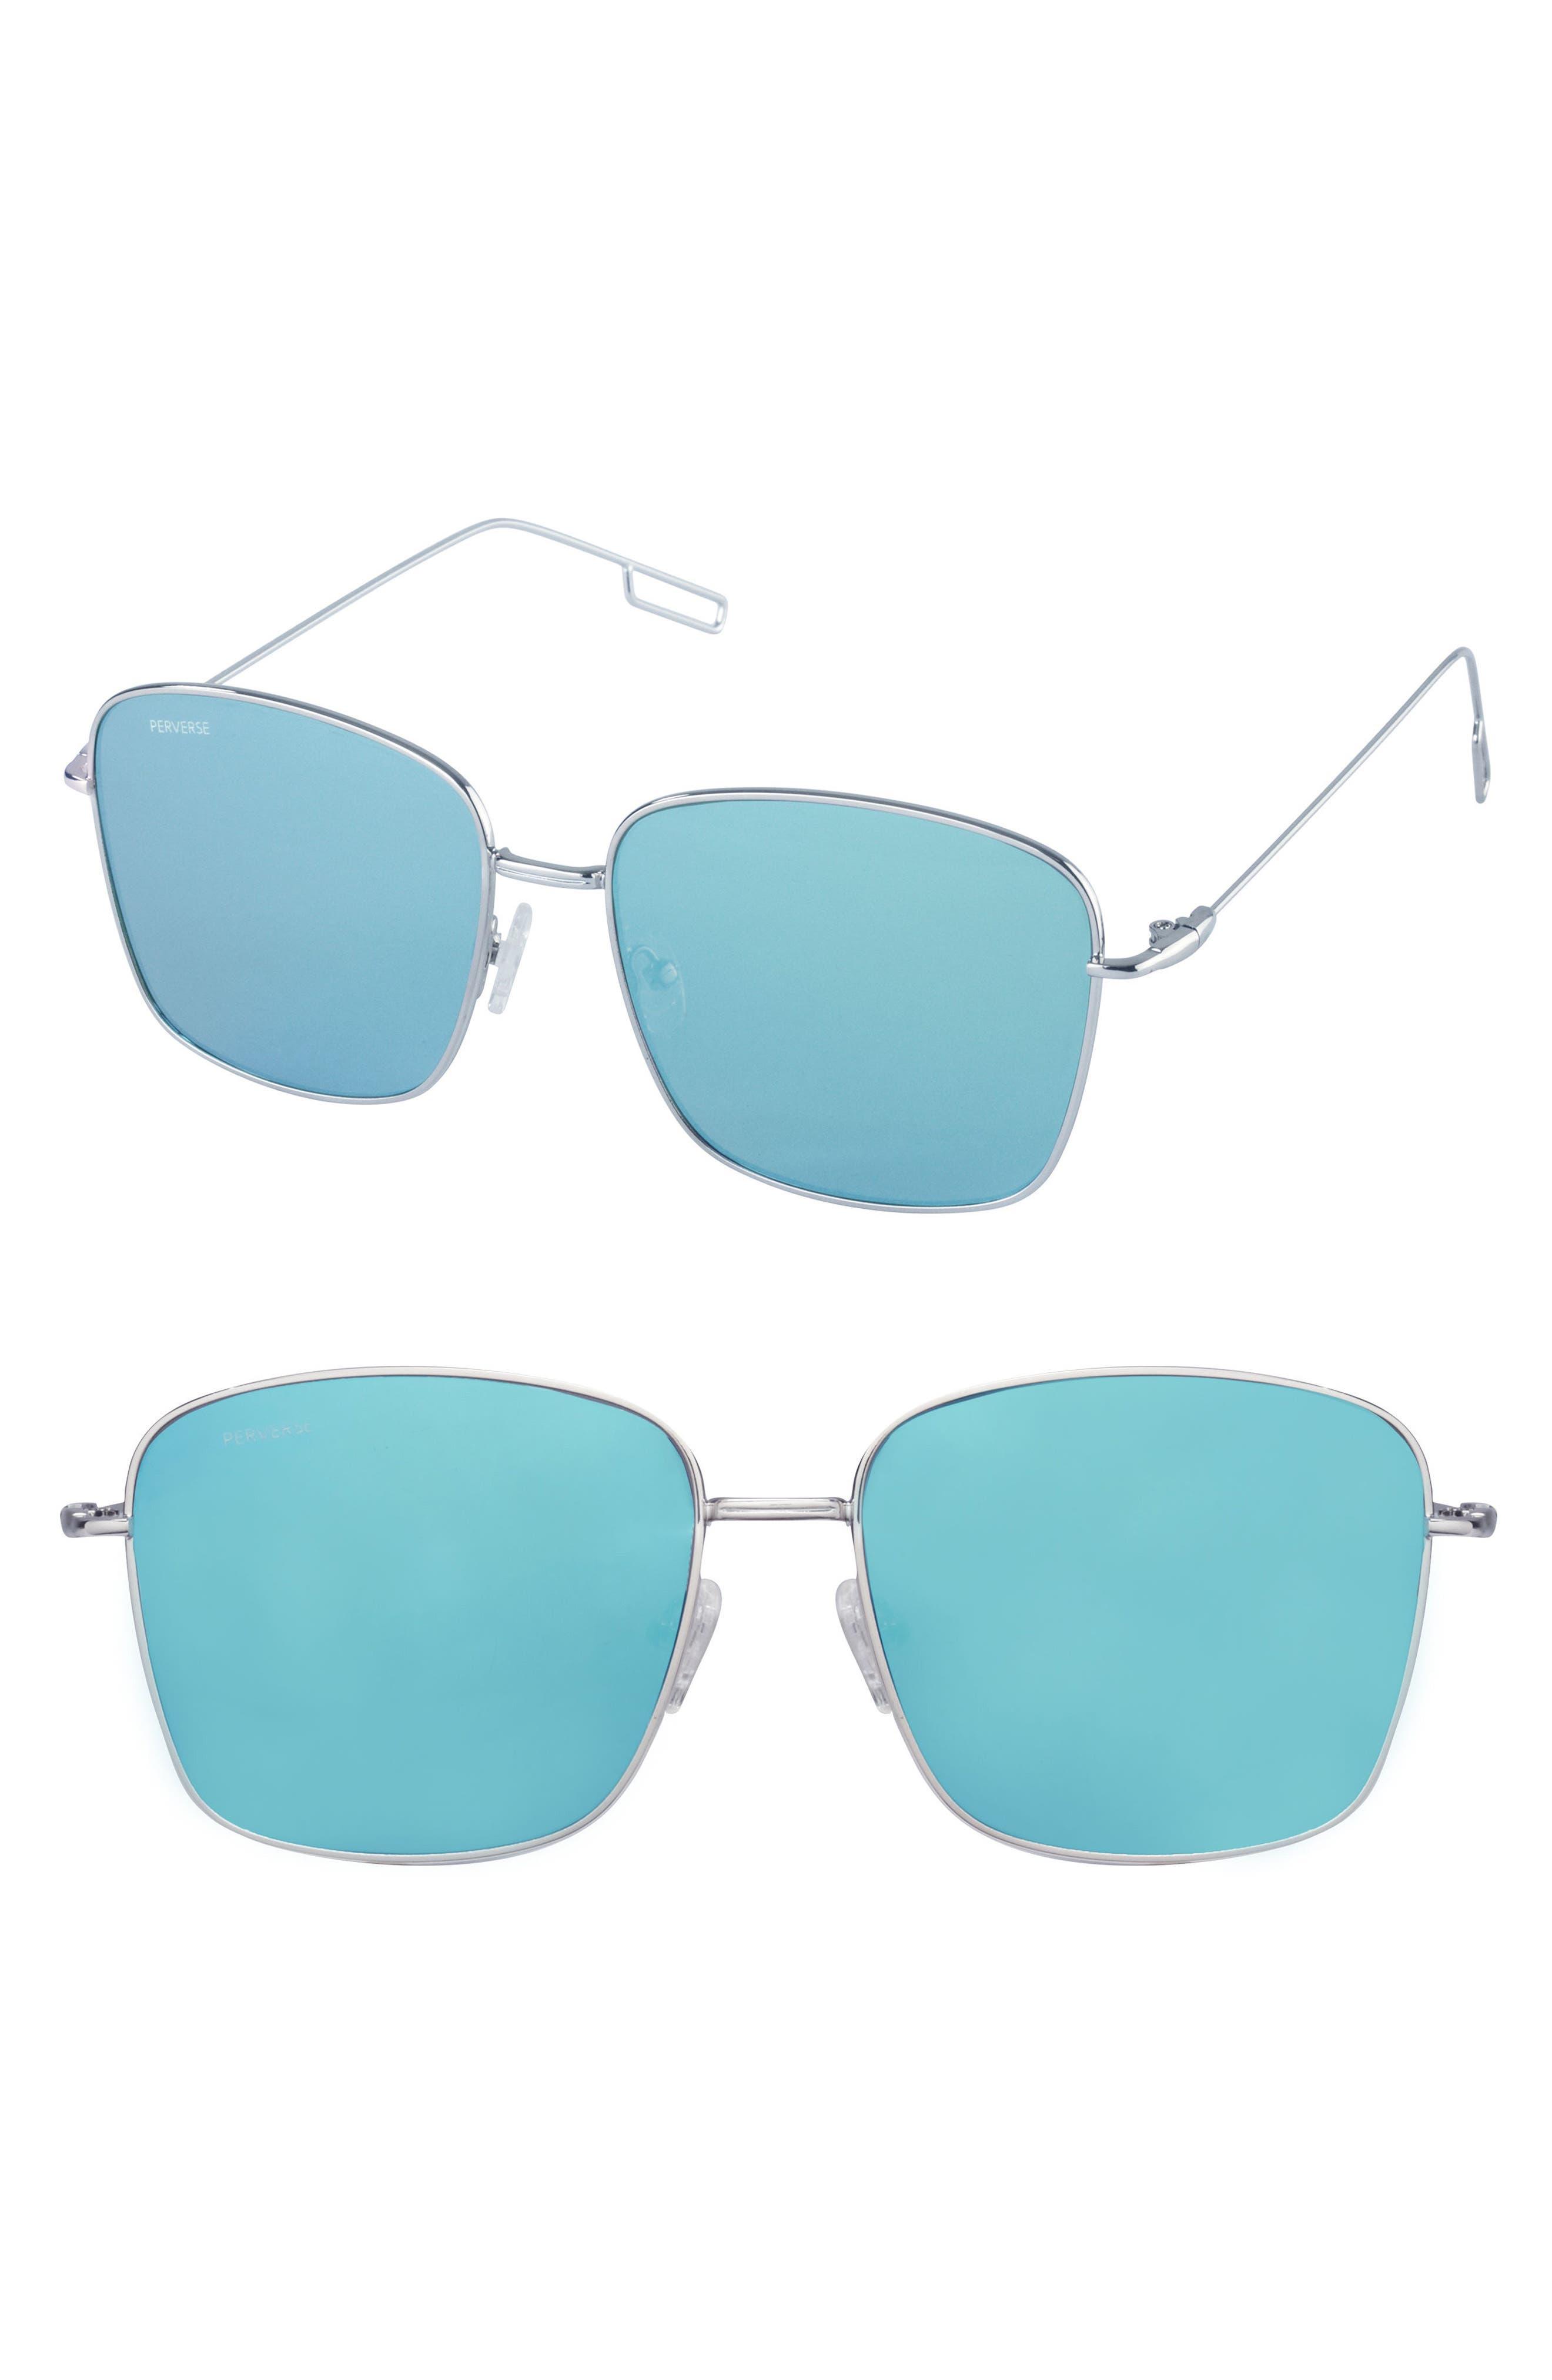 PERVERSE Emily 58mm Mirrored Square Sunglasses